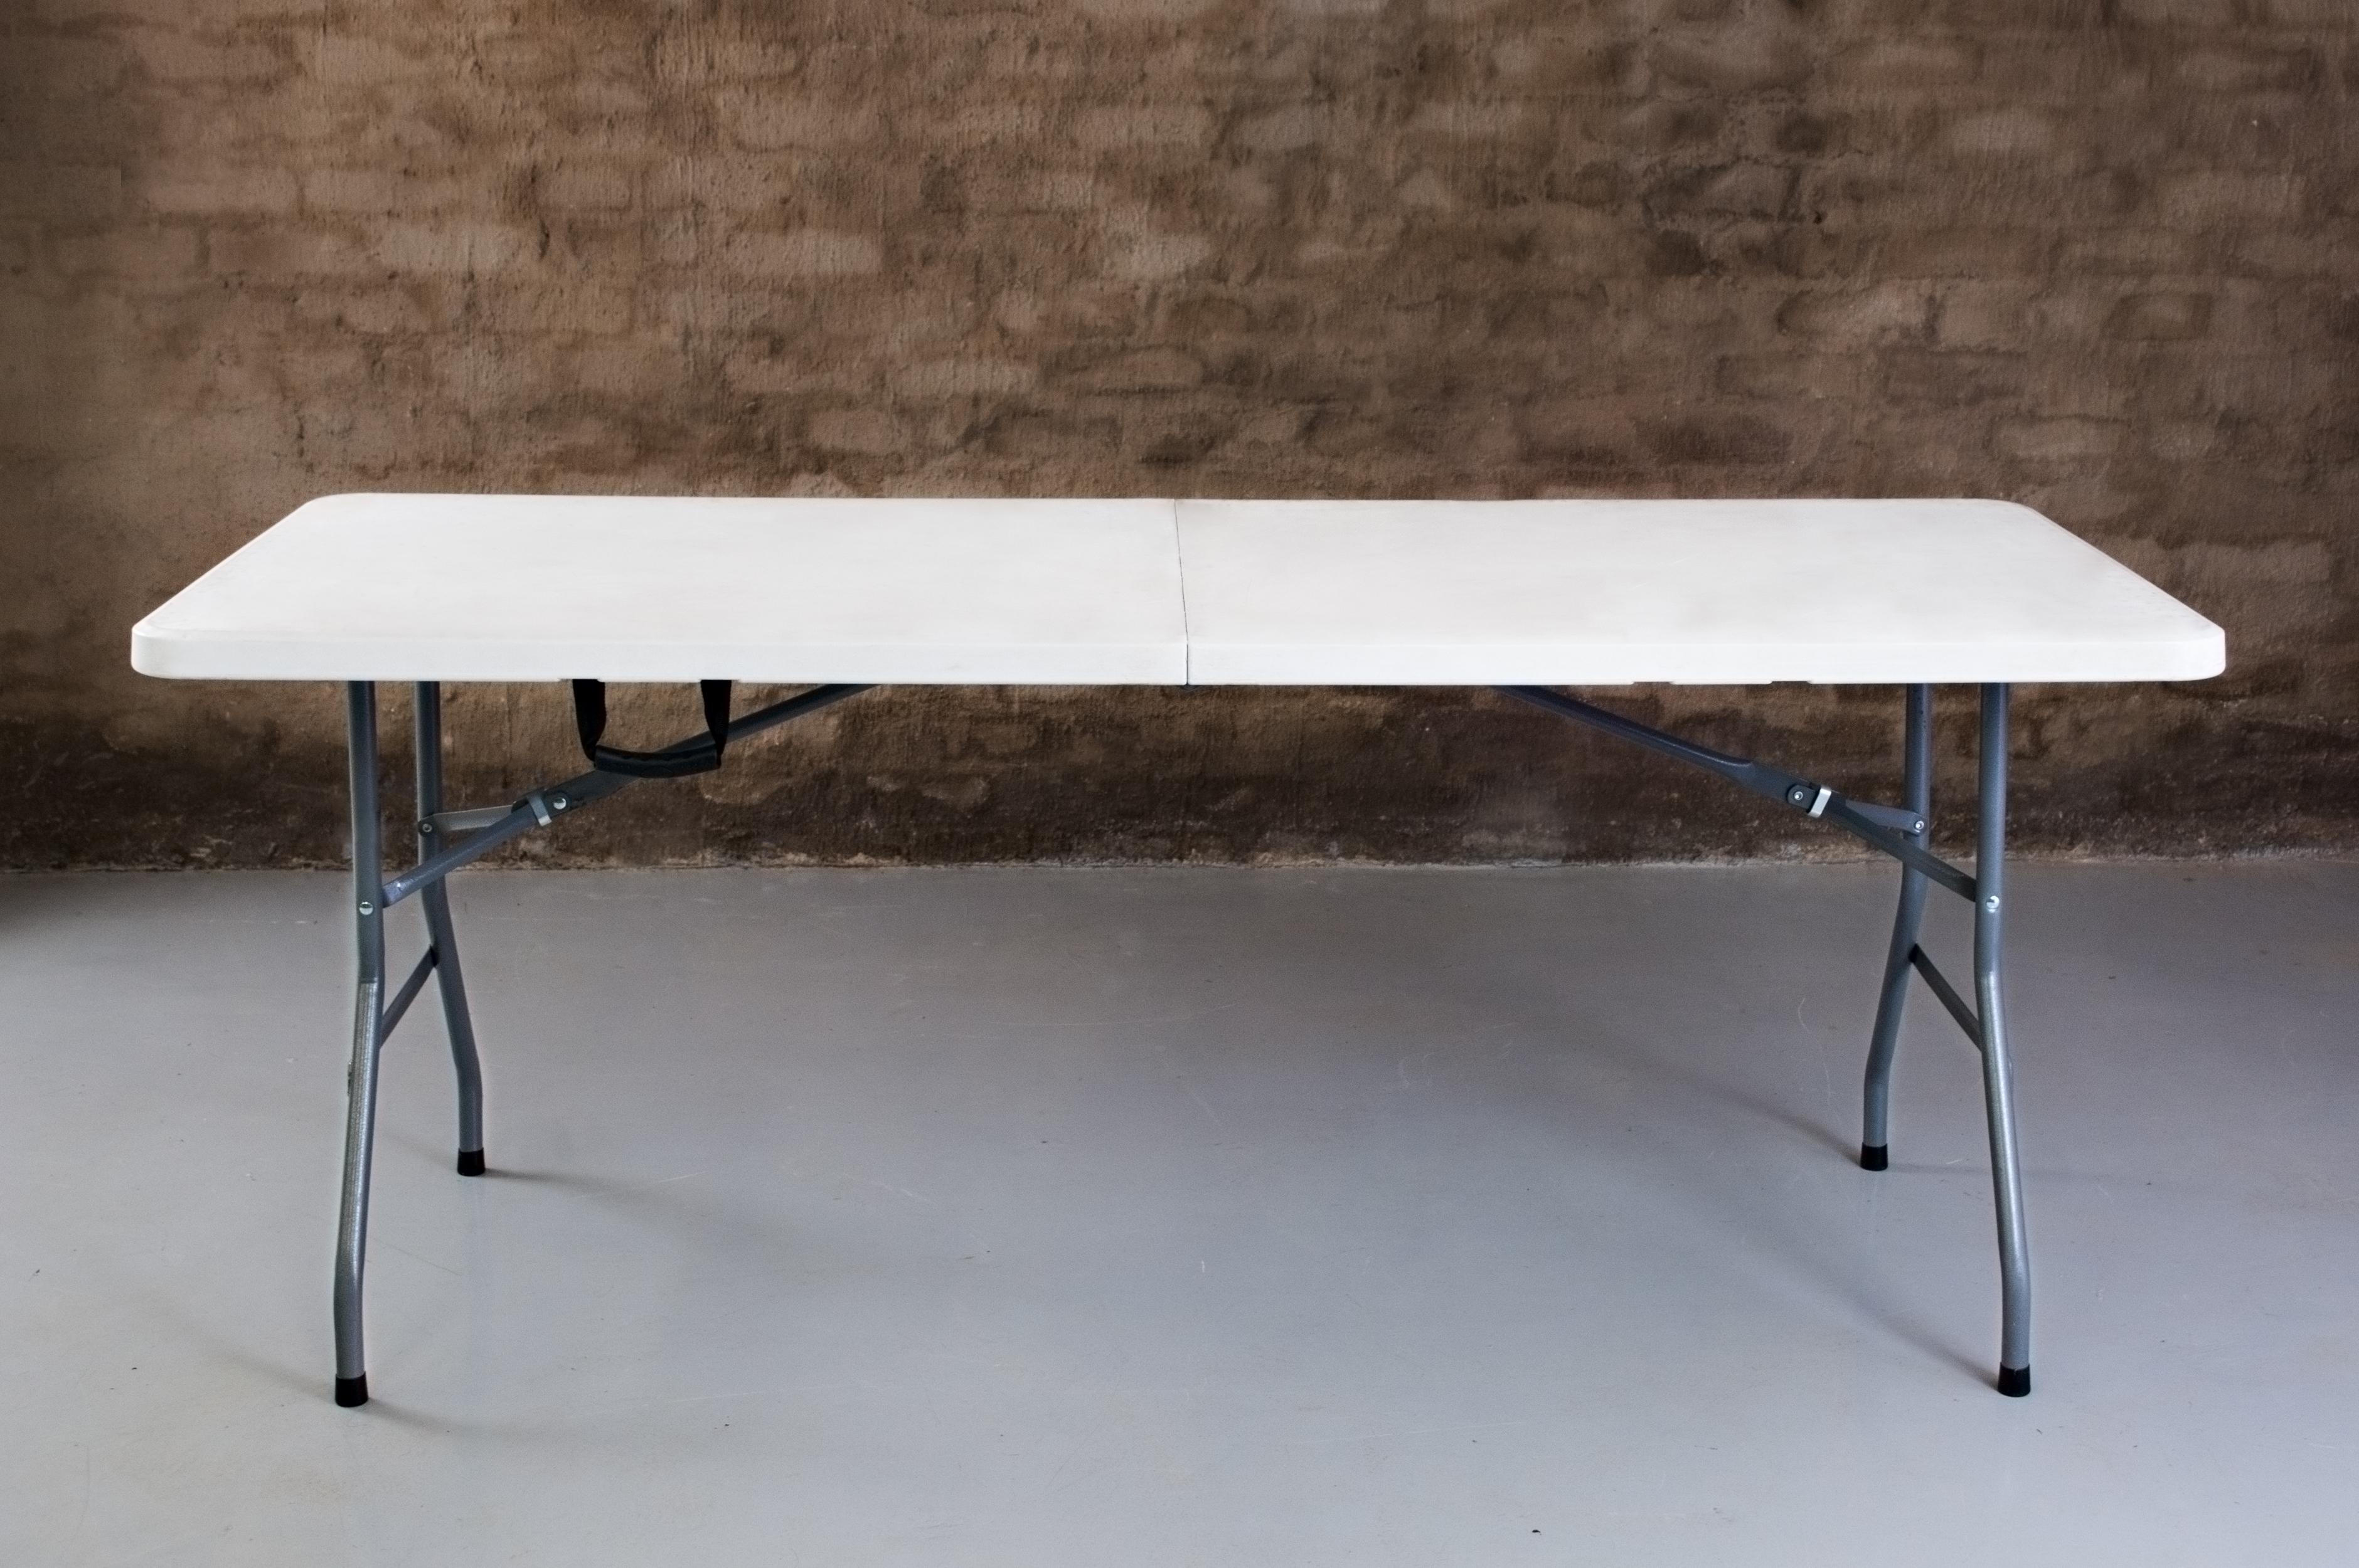 Rectangular table 0 77x1 8m r35